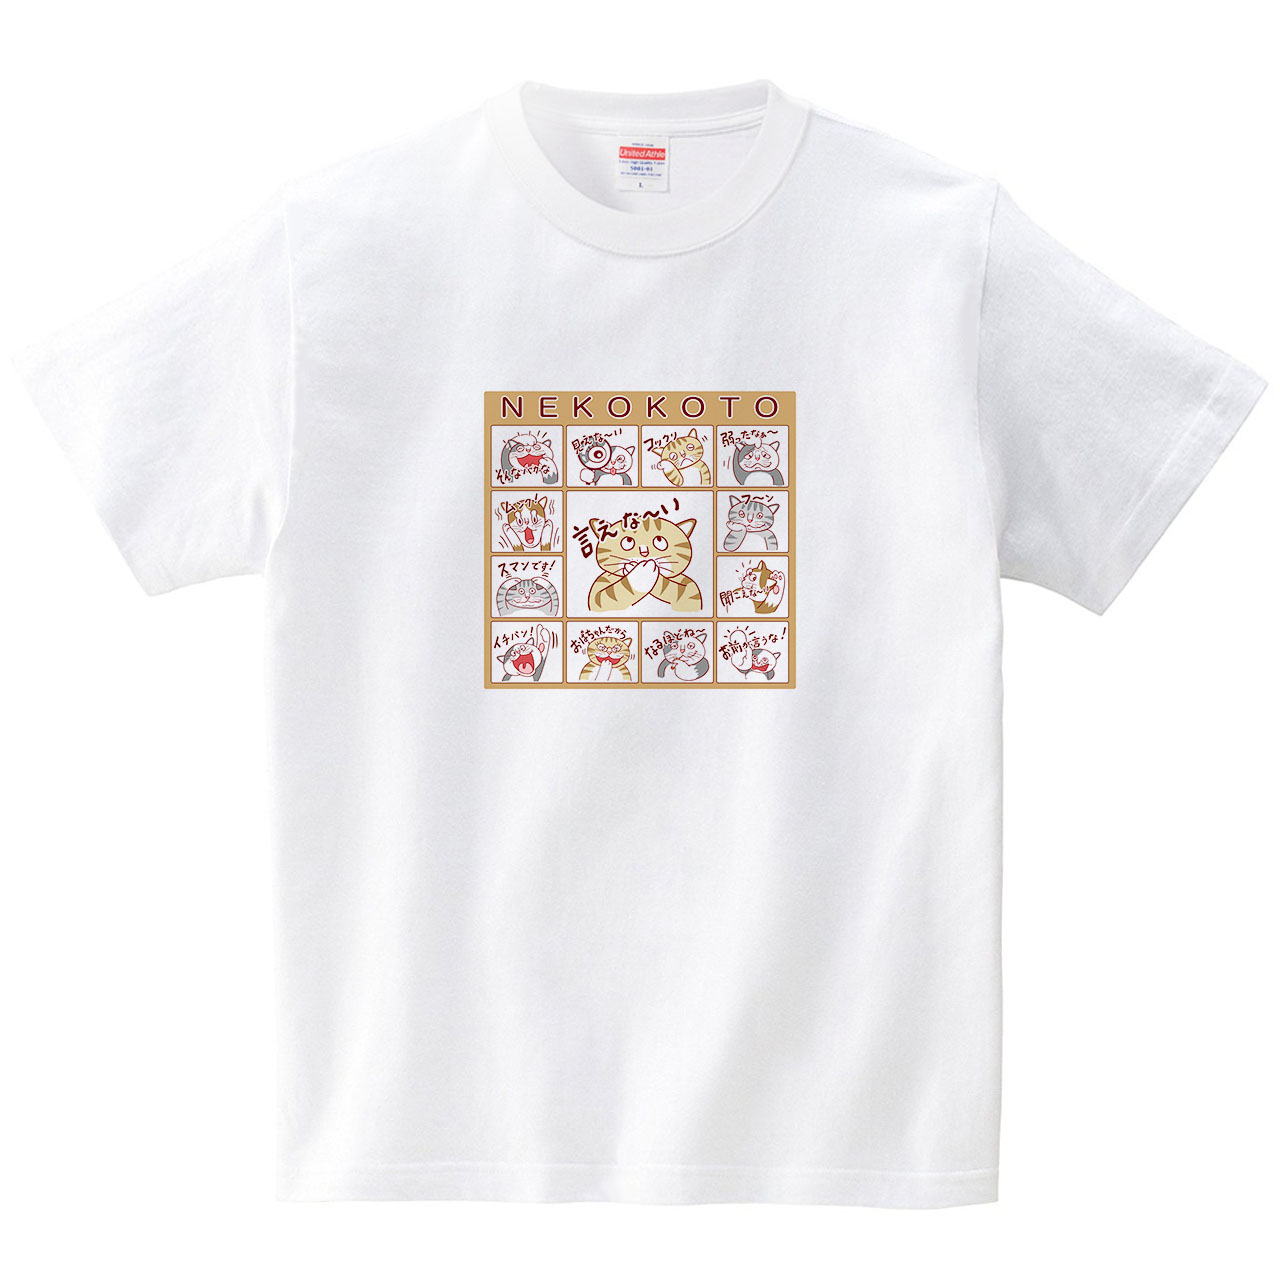 NEKOKOTO(Tシャツ・ホワイト)(永清文明)